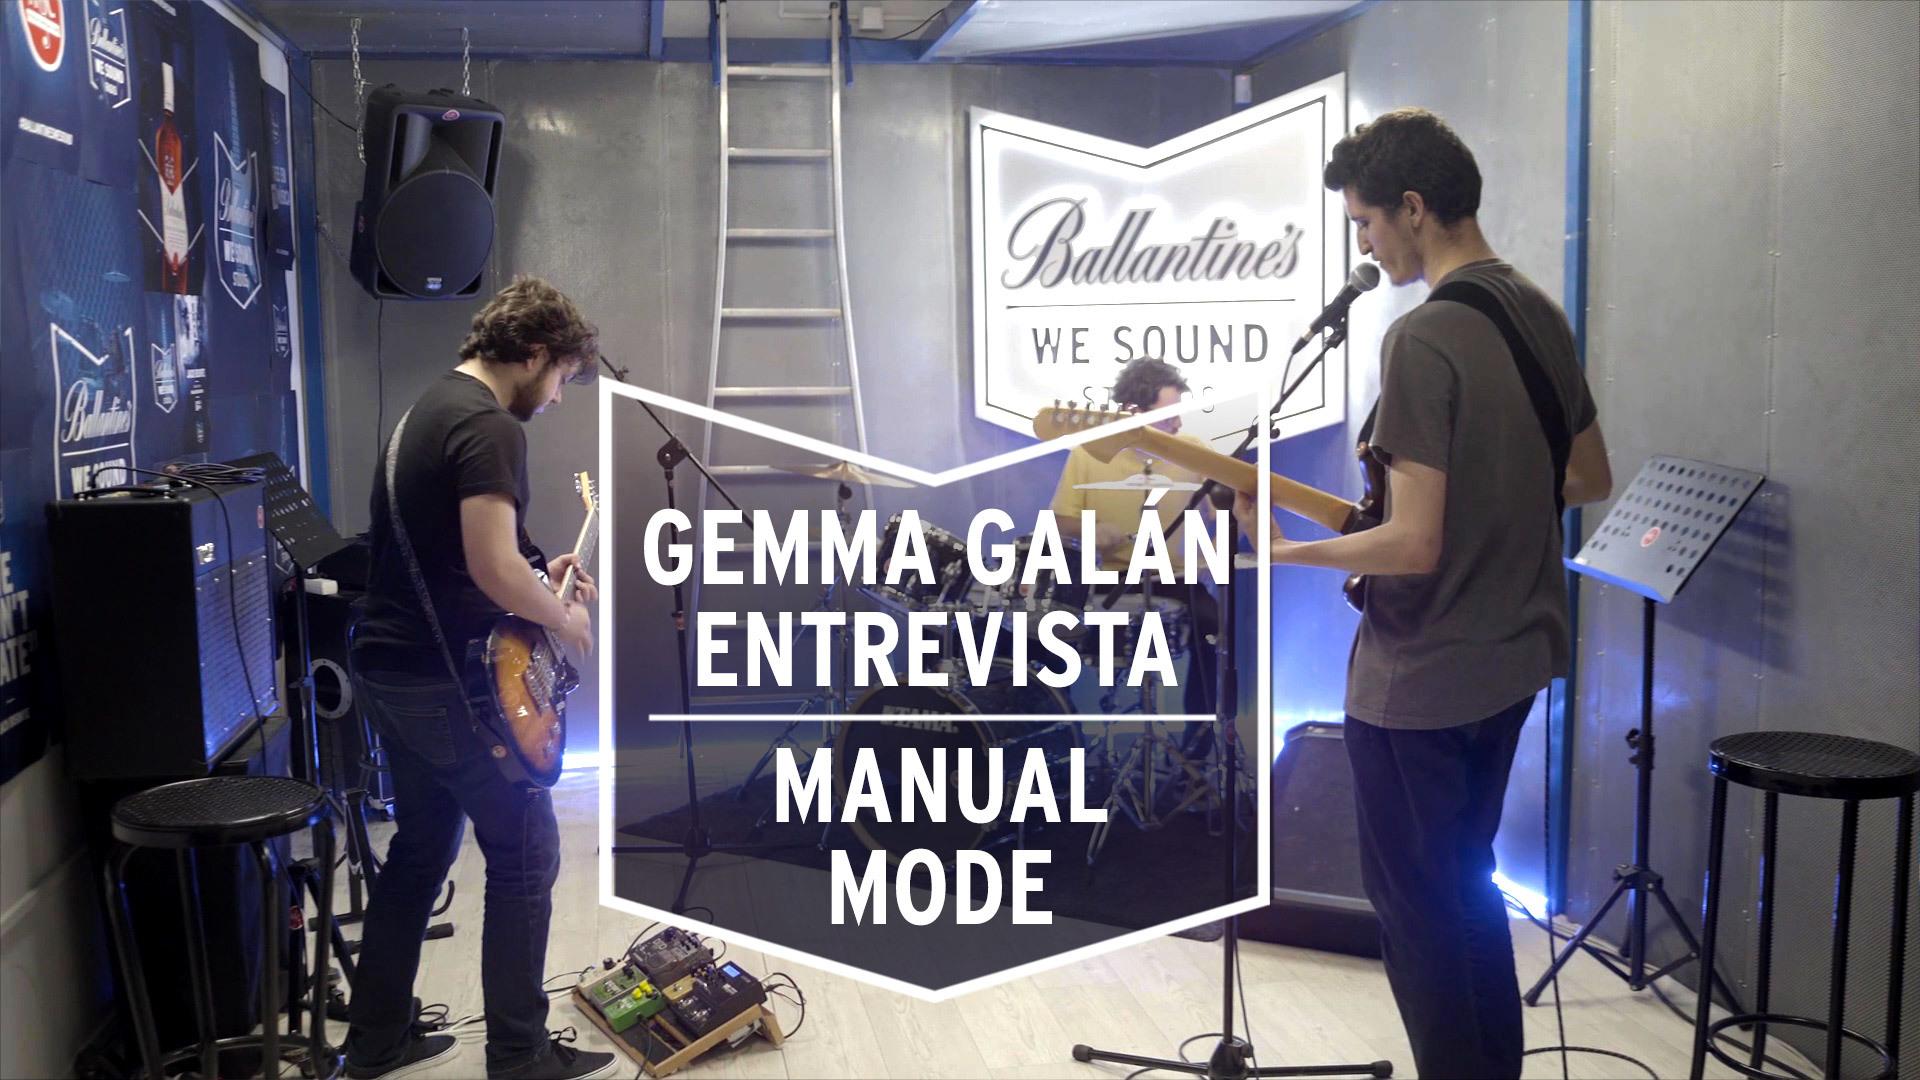 Temporada 1 Gemma Galán entrevista a 'Manual Mode' en su ensayo   We Sound